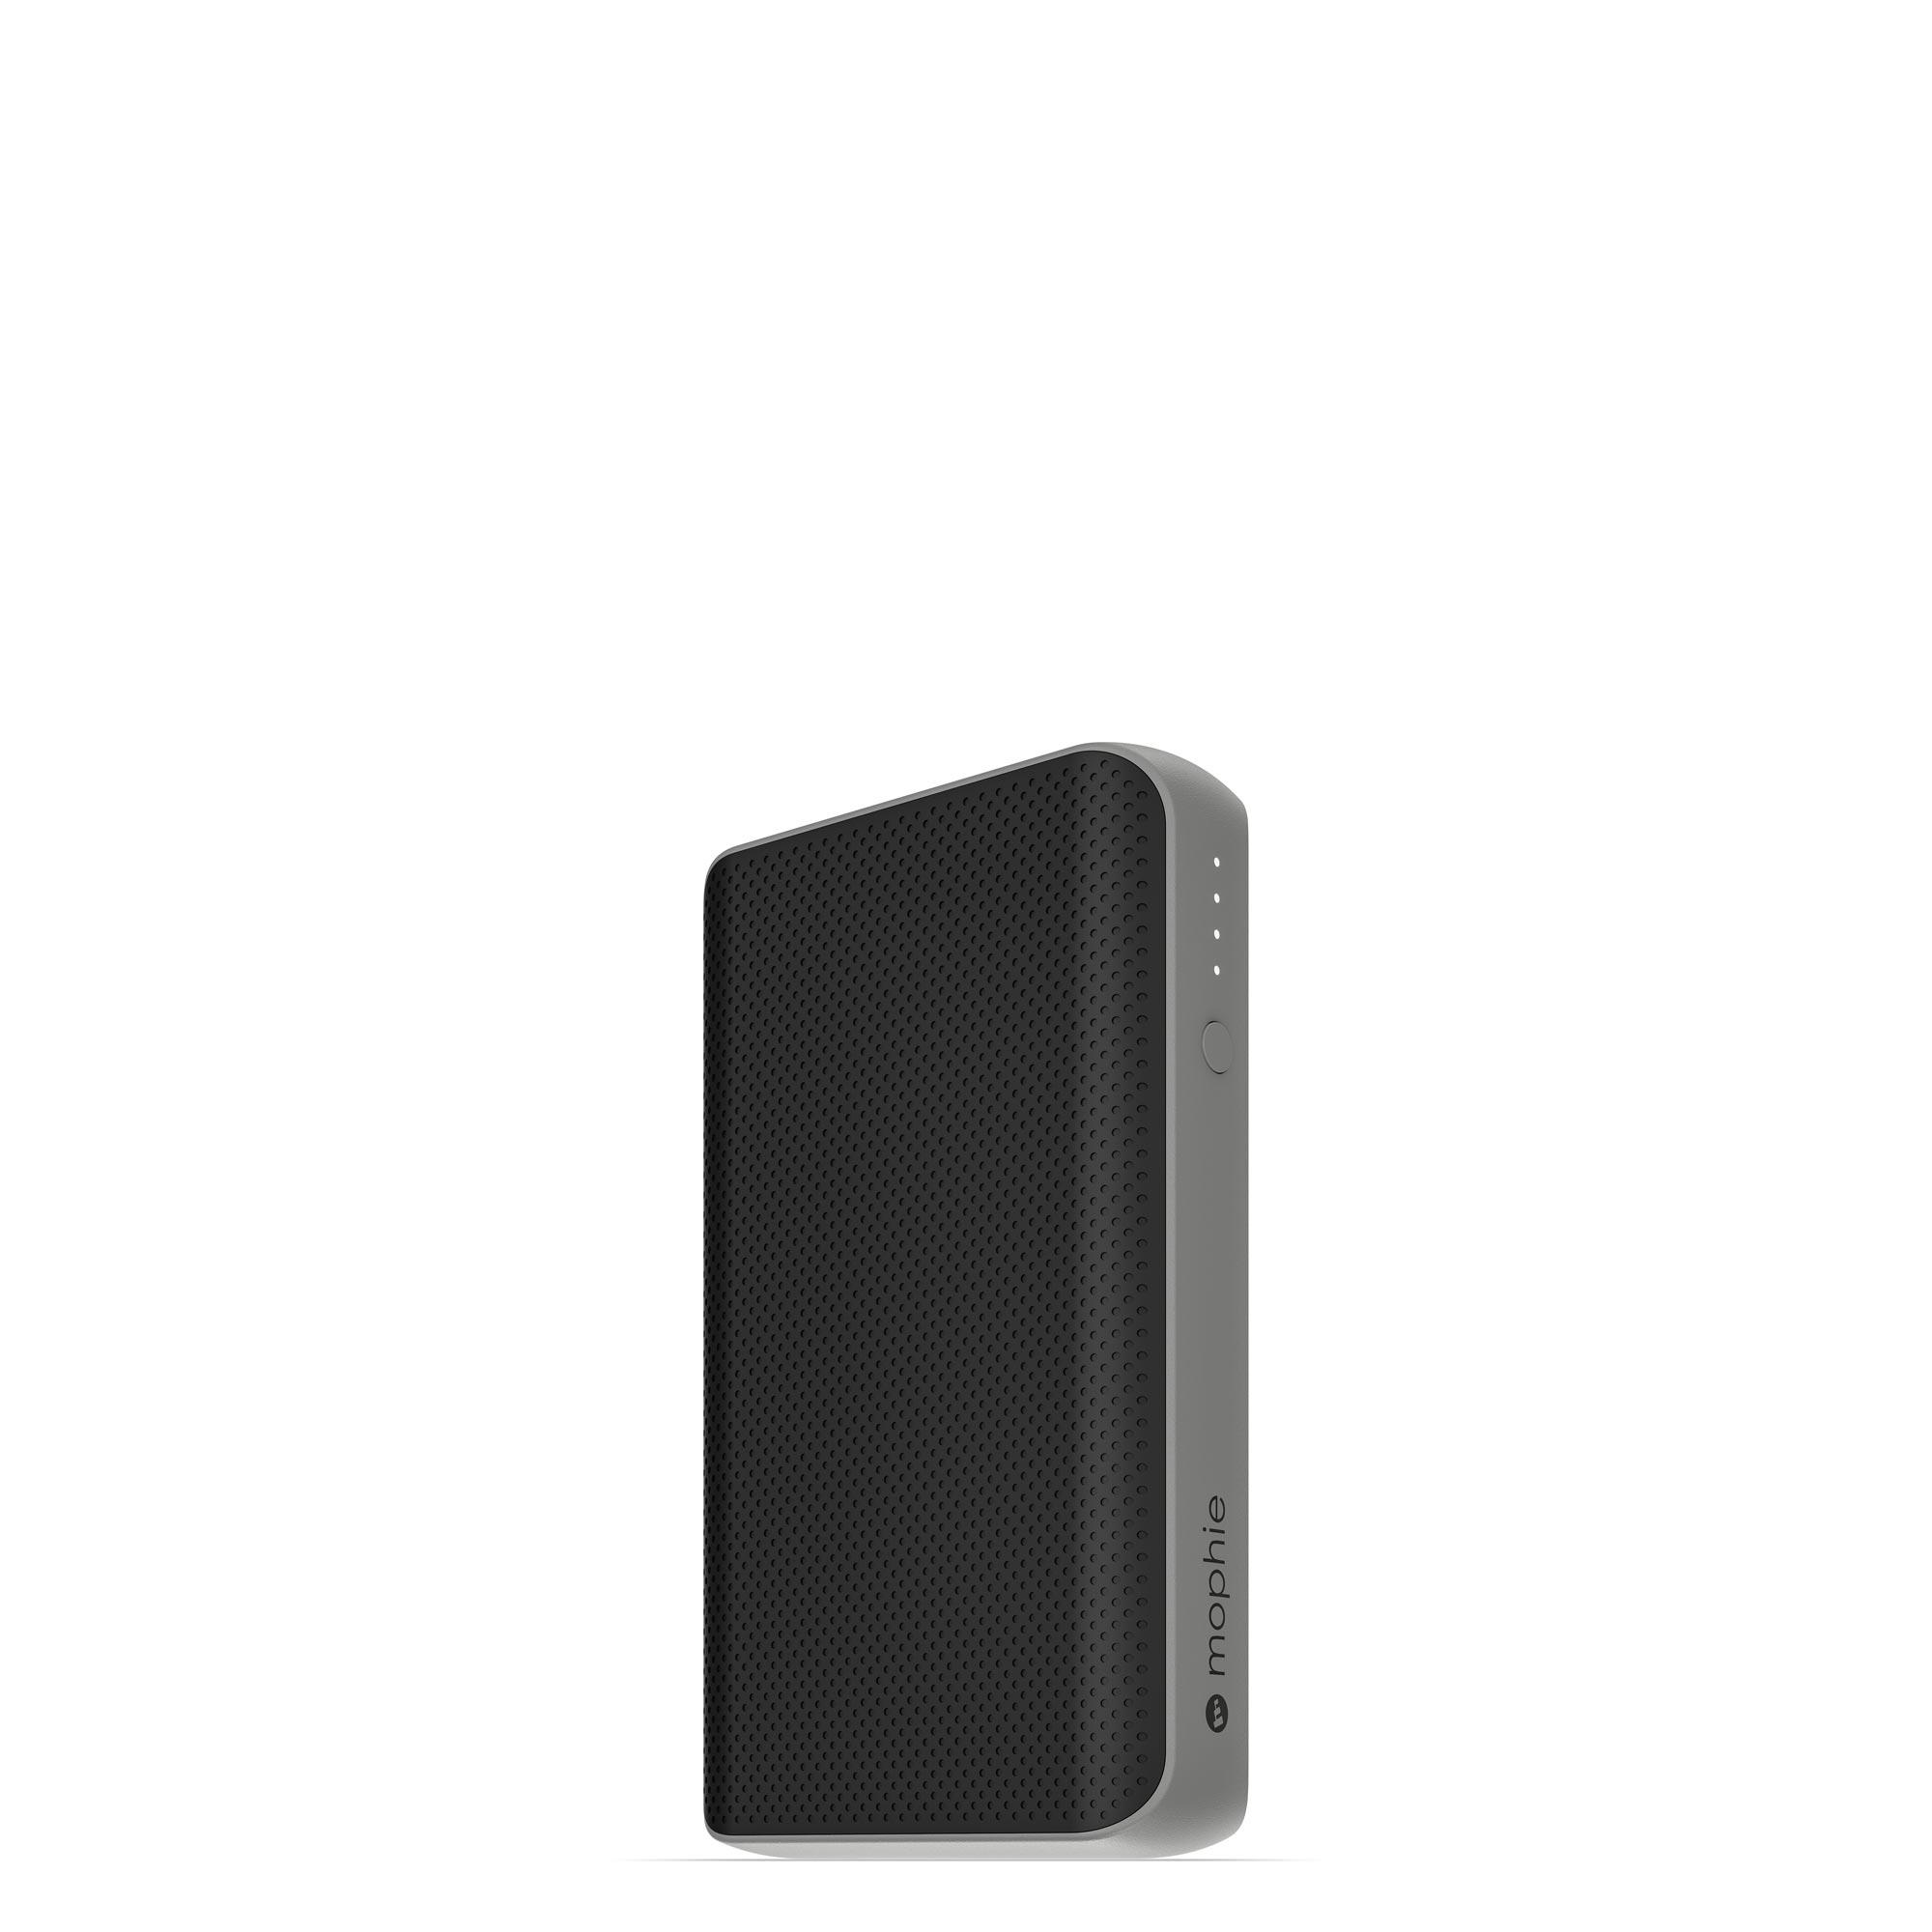 mophie 401101508 batería externa Negro 10050 mAh